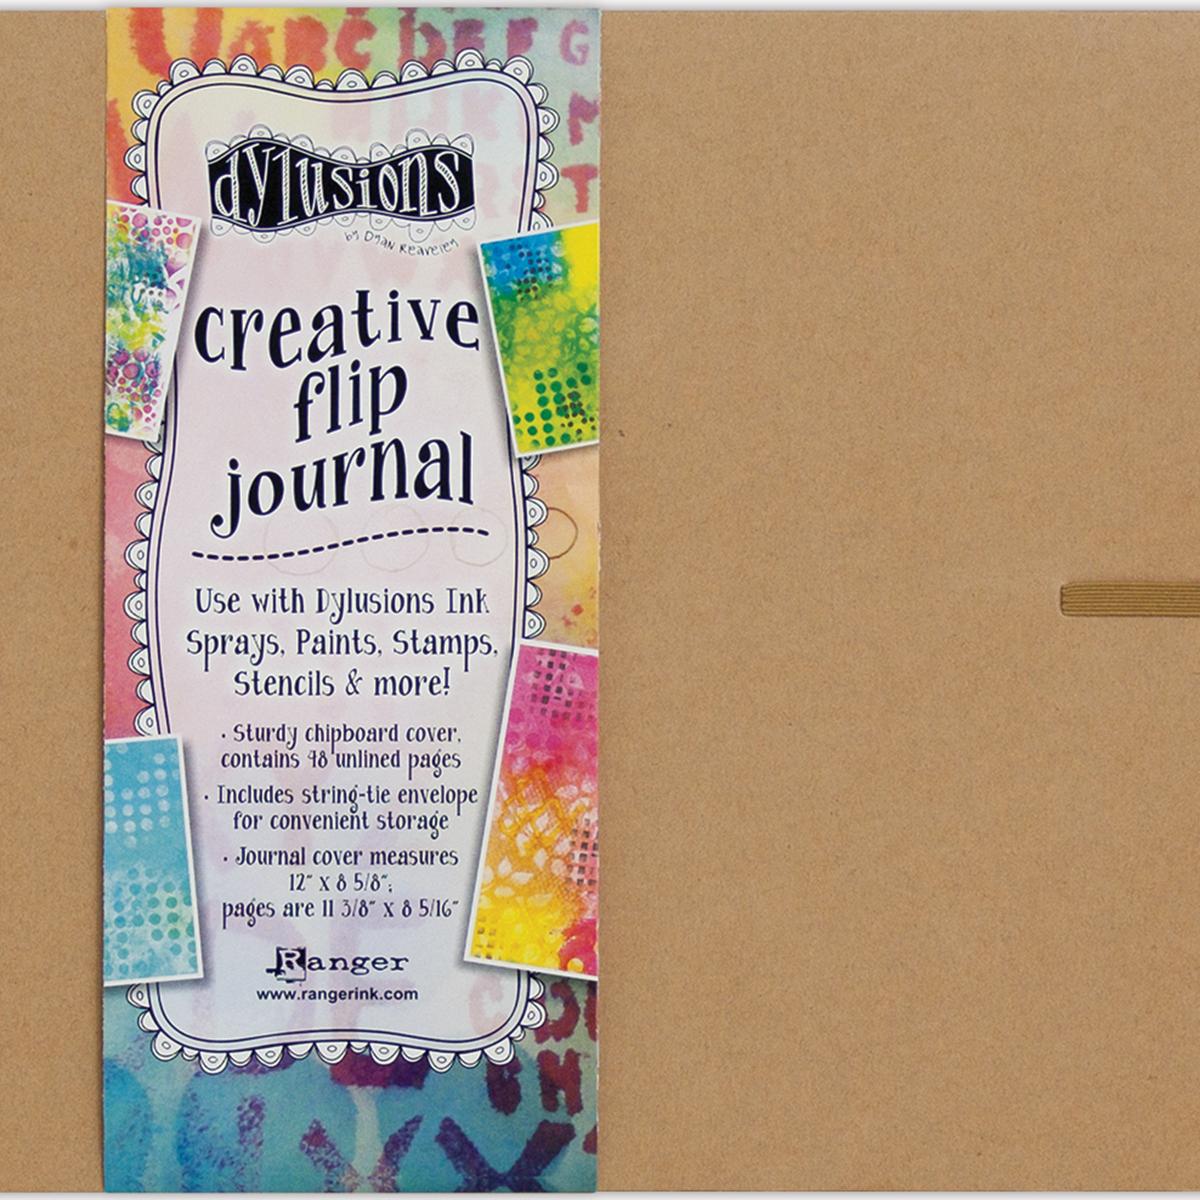 Dylusions Creative Flip Journal 8x12